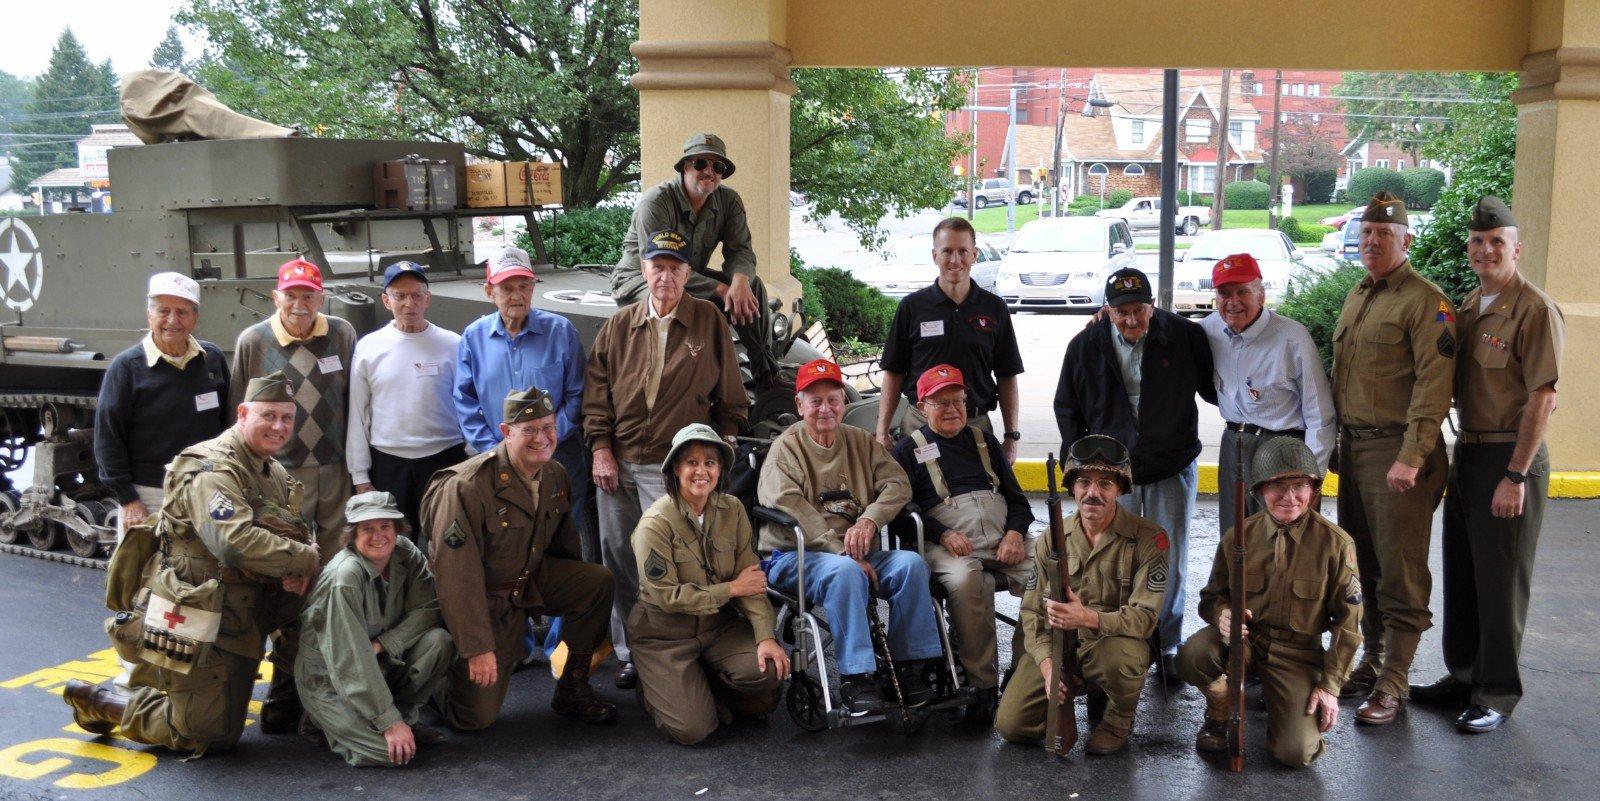 veterans and reenactors (2) - outside Quality Inn.JPG